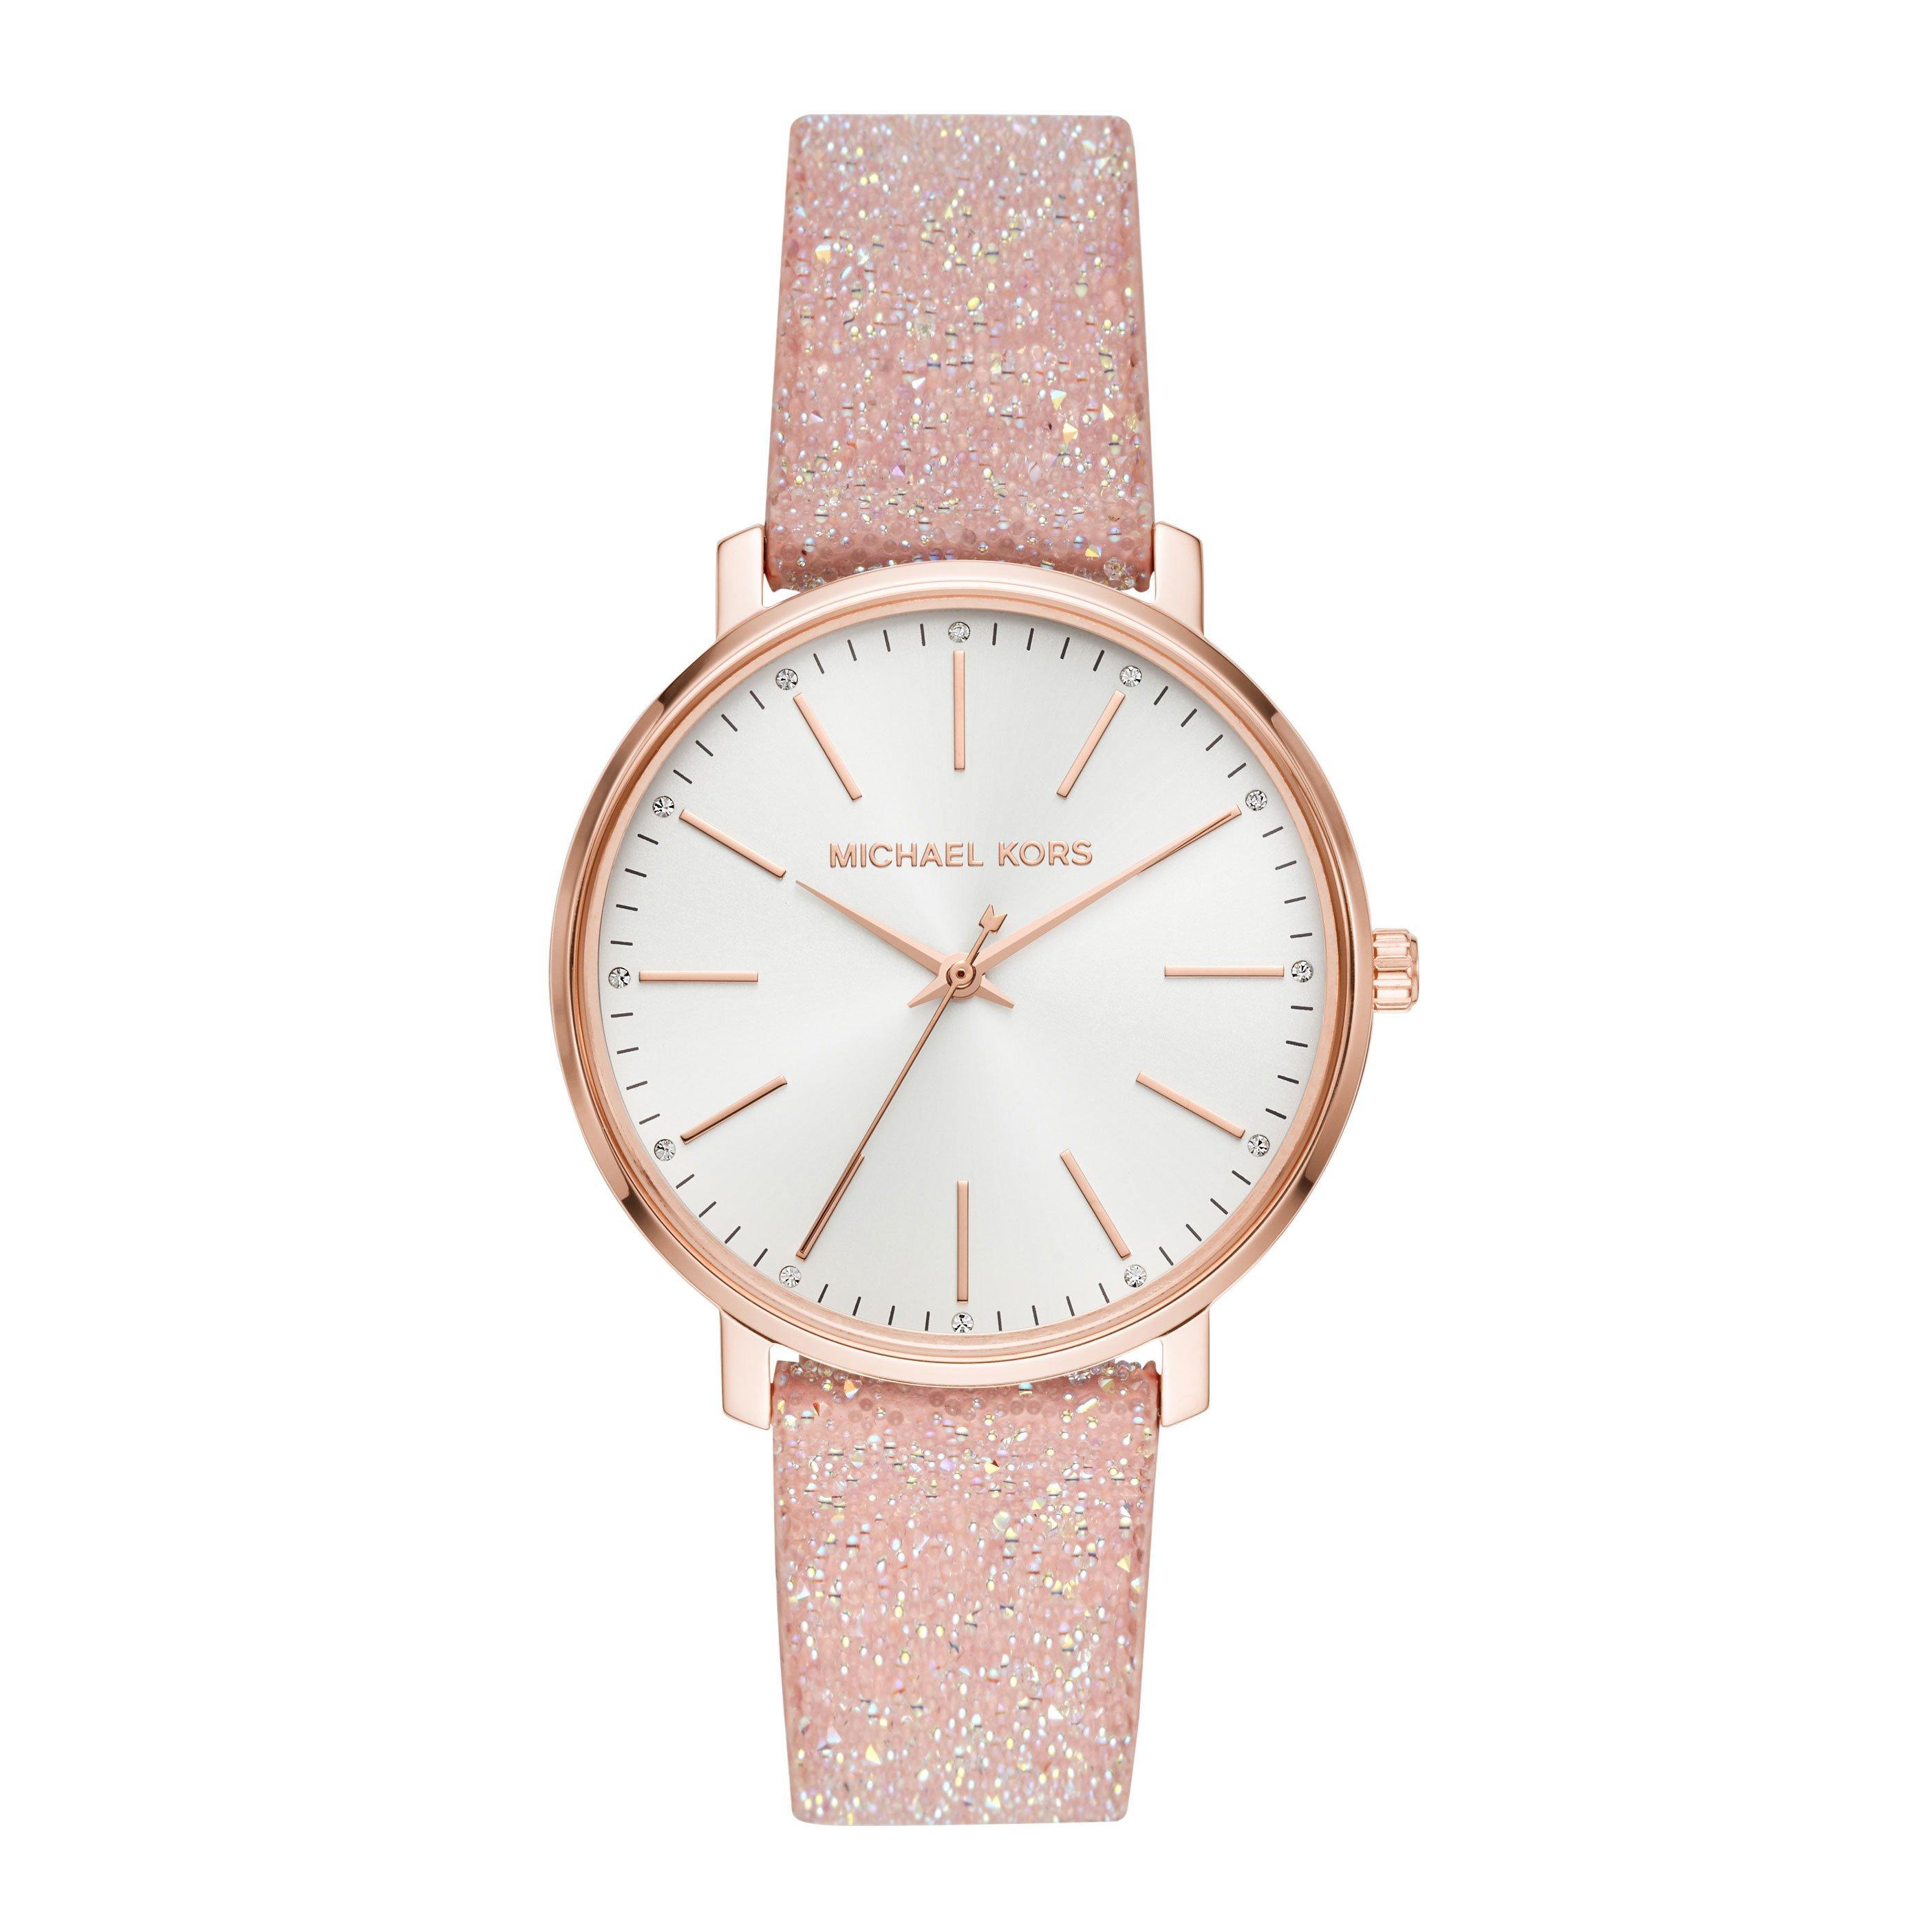 Michael Kors Pyper Glitz Rose Gold Plated Ladies Watch